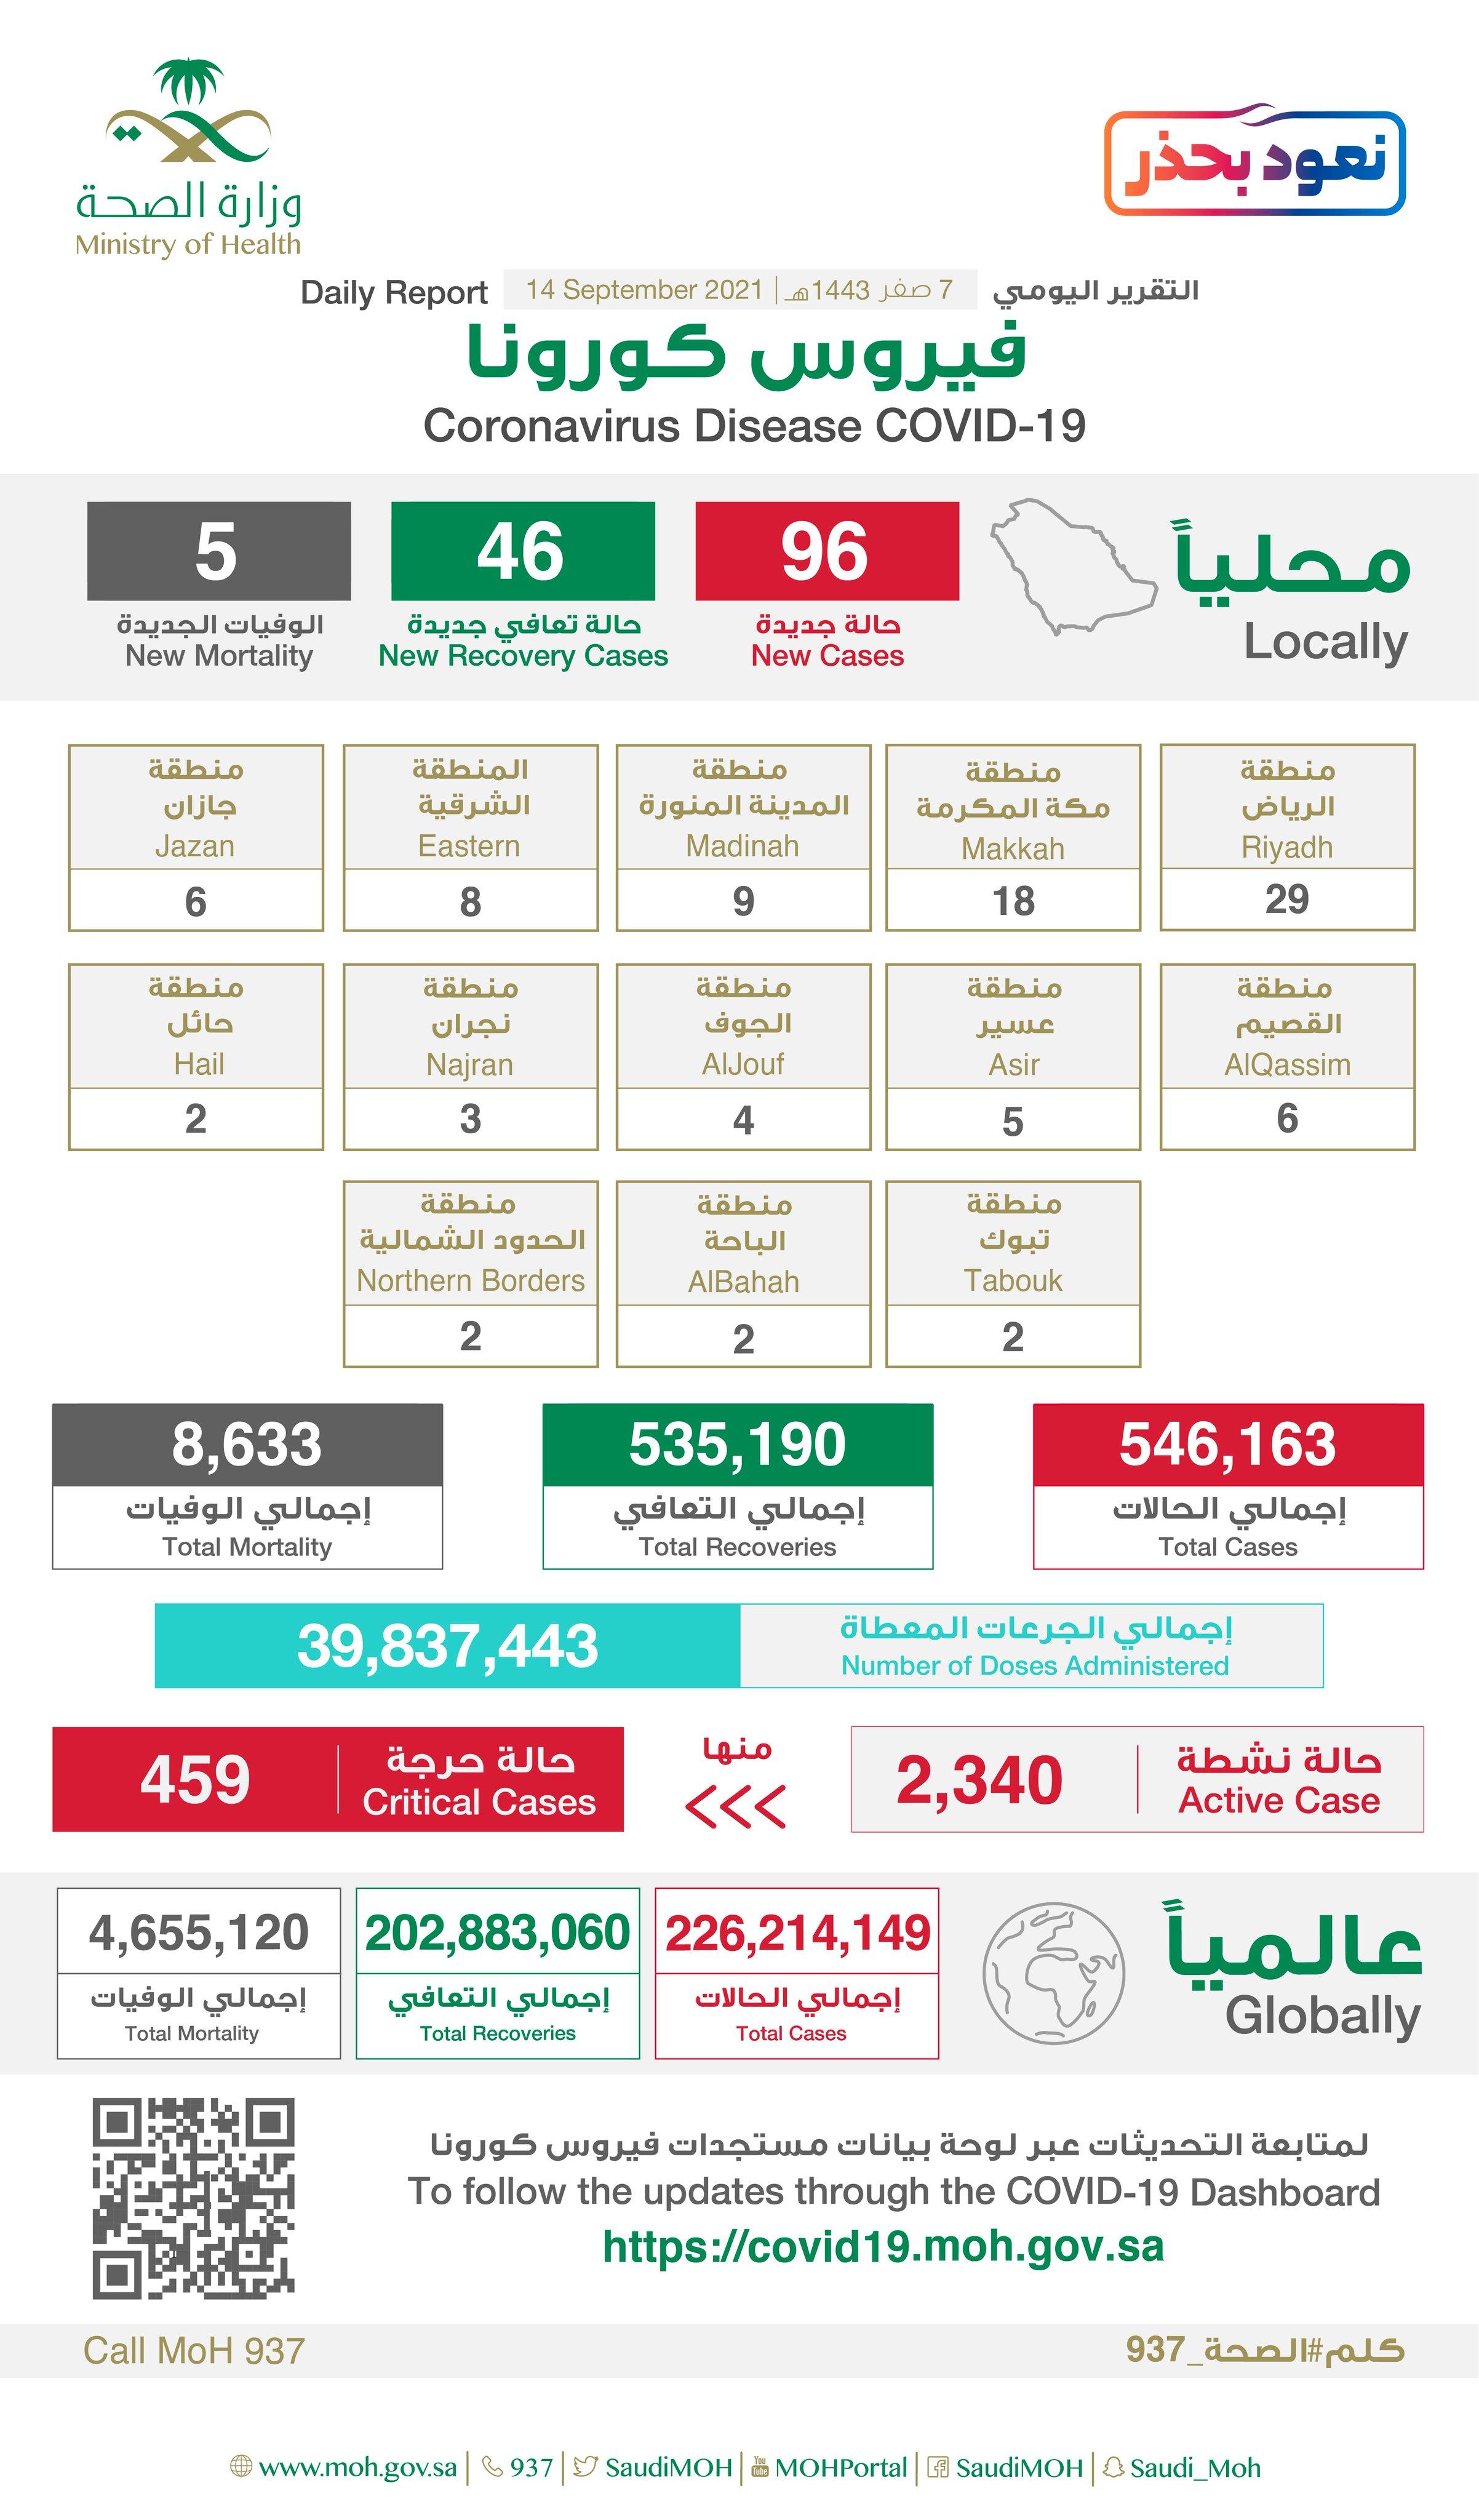 Saudi Arabia Coronavirus : Total Cases : 546,163 , New Cases : 96, Cured : 535,190 , Deaths: 8,633, Active Cases : 2,340